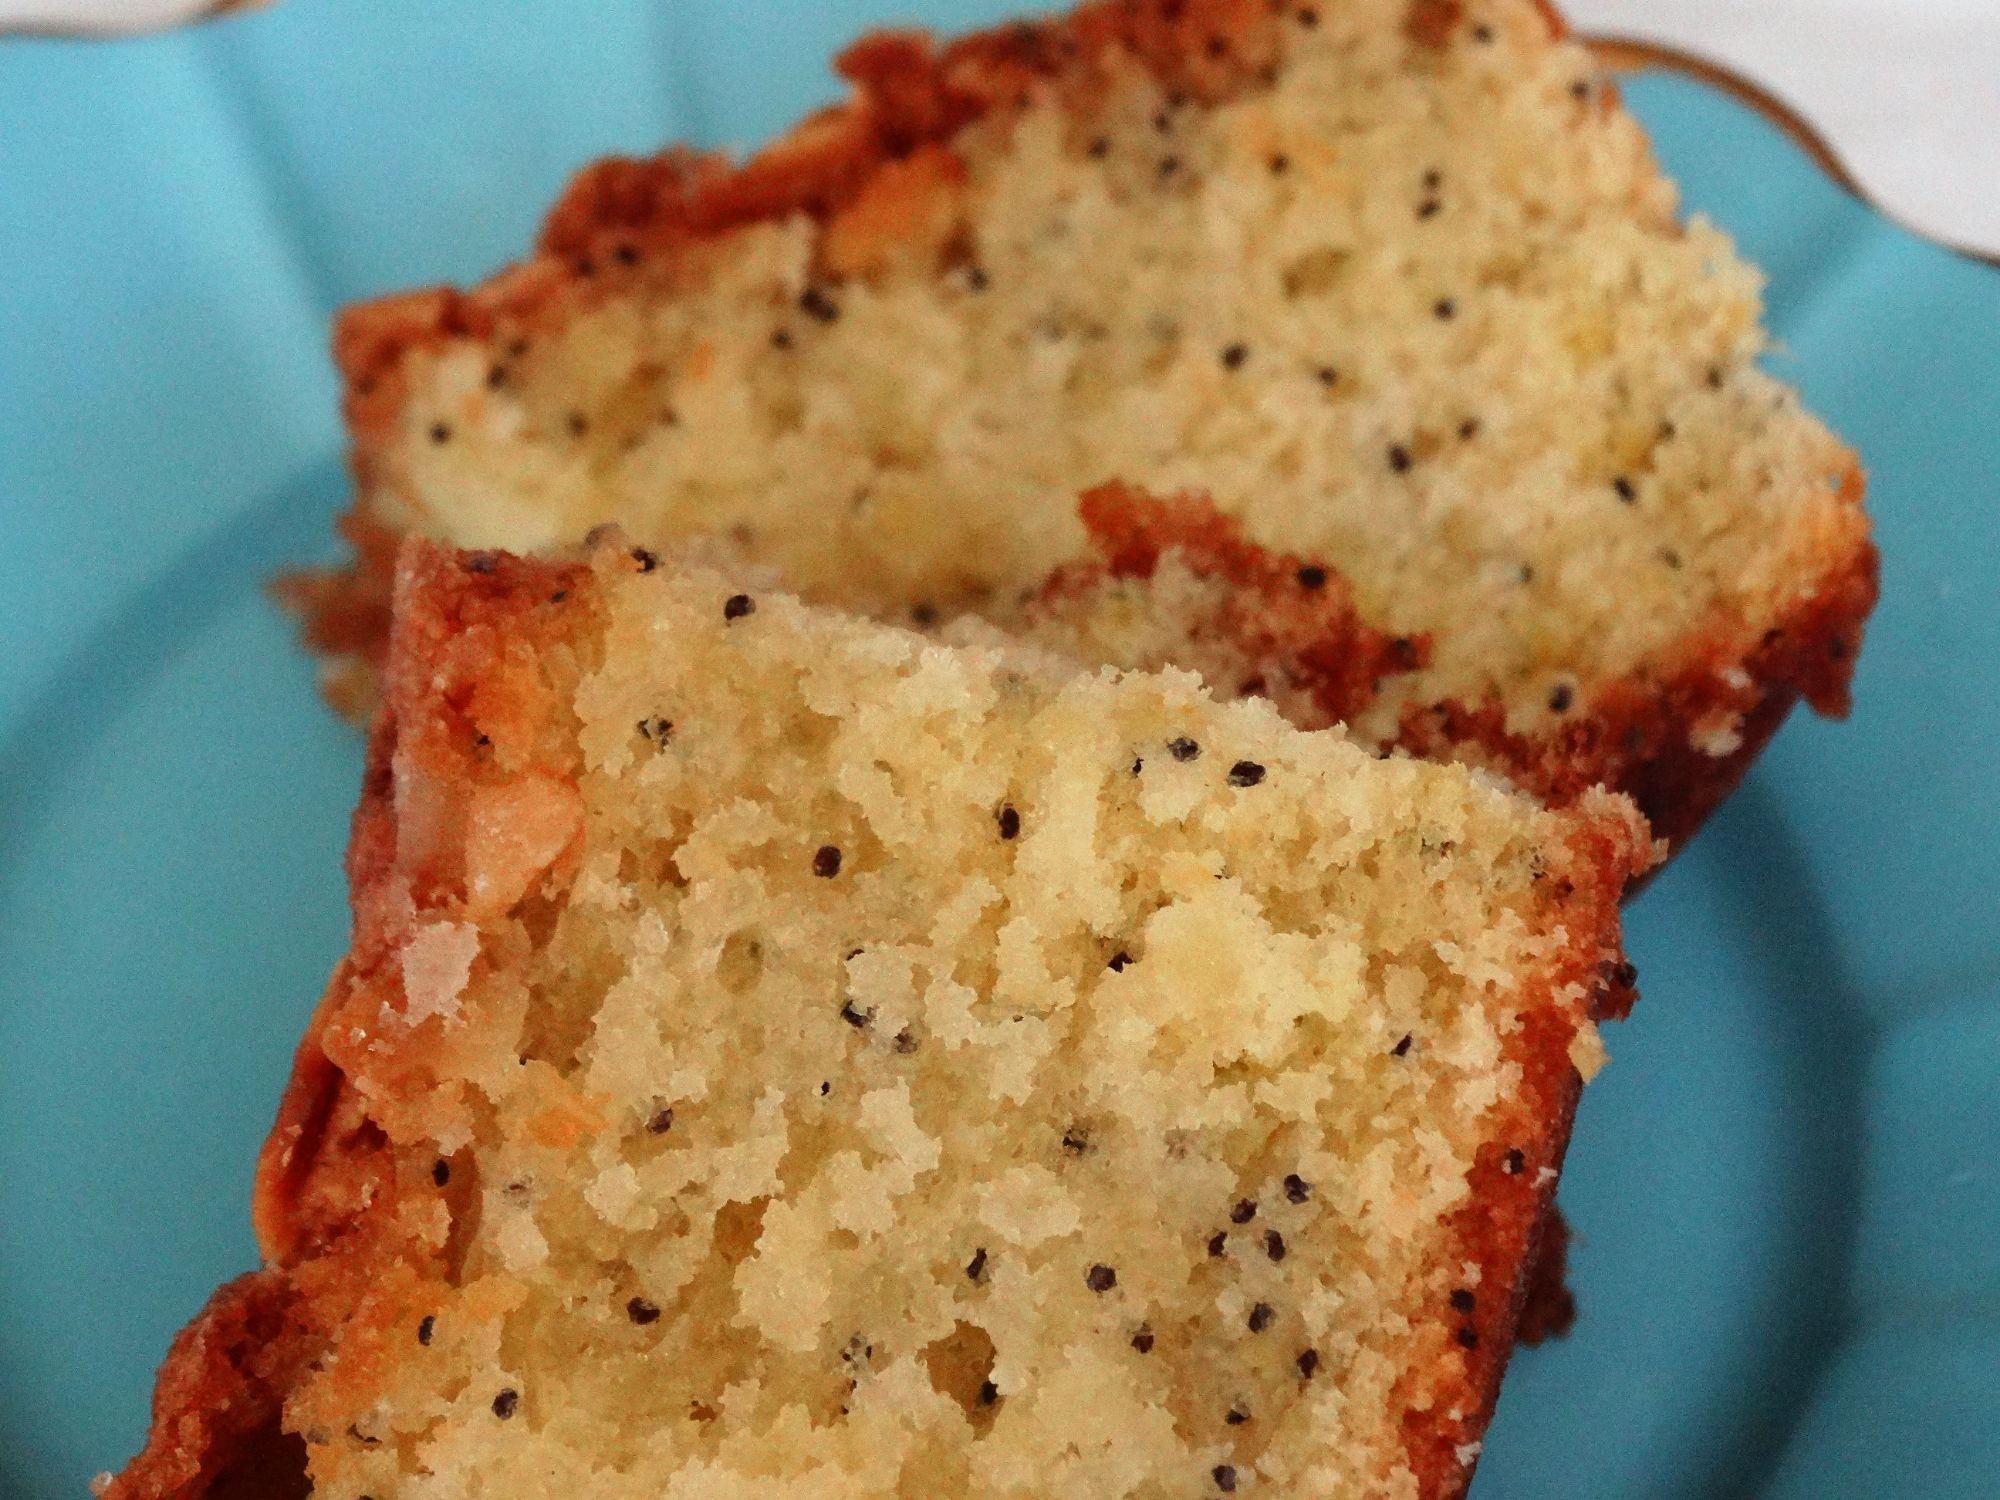 Lemon Almond and Poppyseed Cake